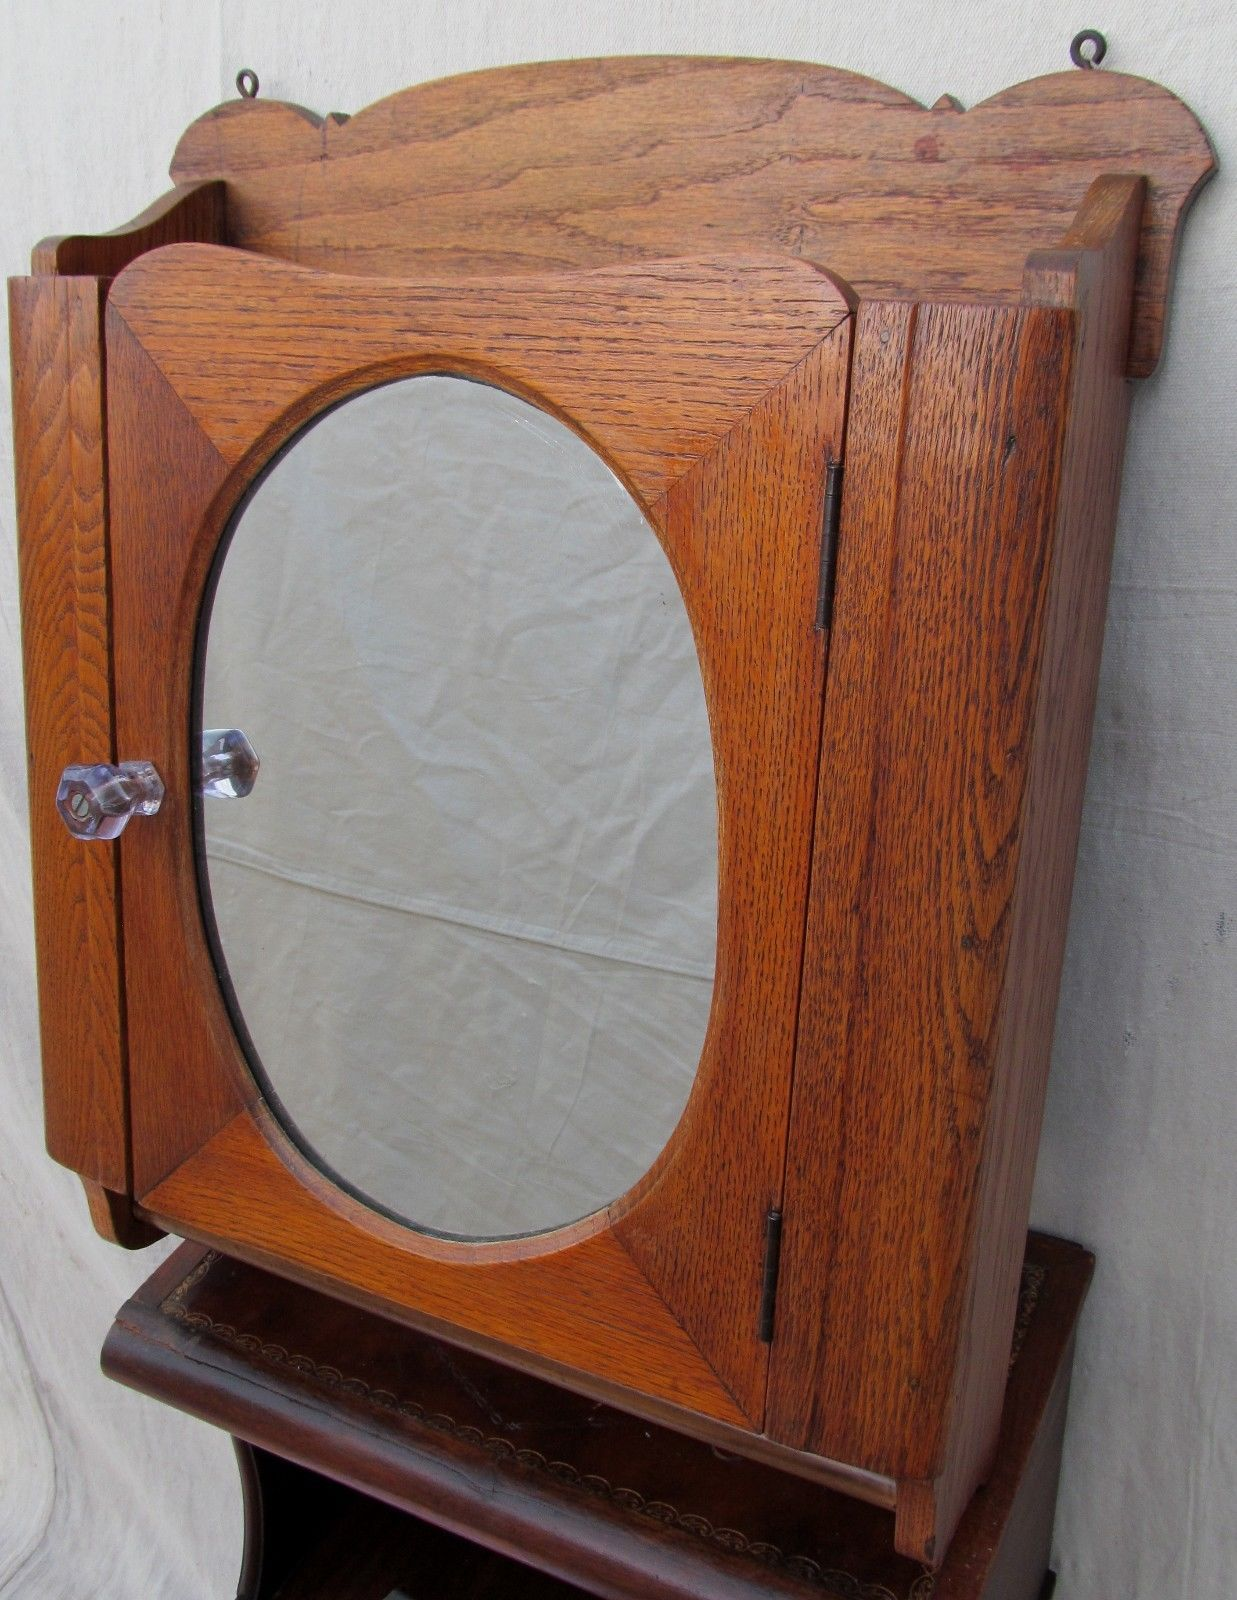 FINE ANTIQUE OAK MEDICINE CABINET WITH TOWEL BAR-EXCELLENT PIECE WITH  QUALITY! | eBay - Fine Victorian Oak Medicine Cabinet With Towel Bar Medicine